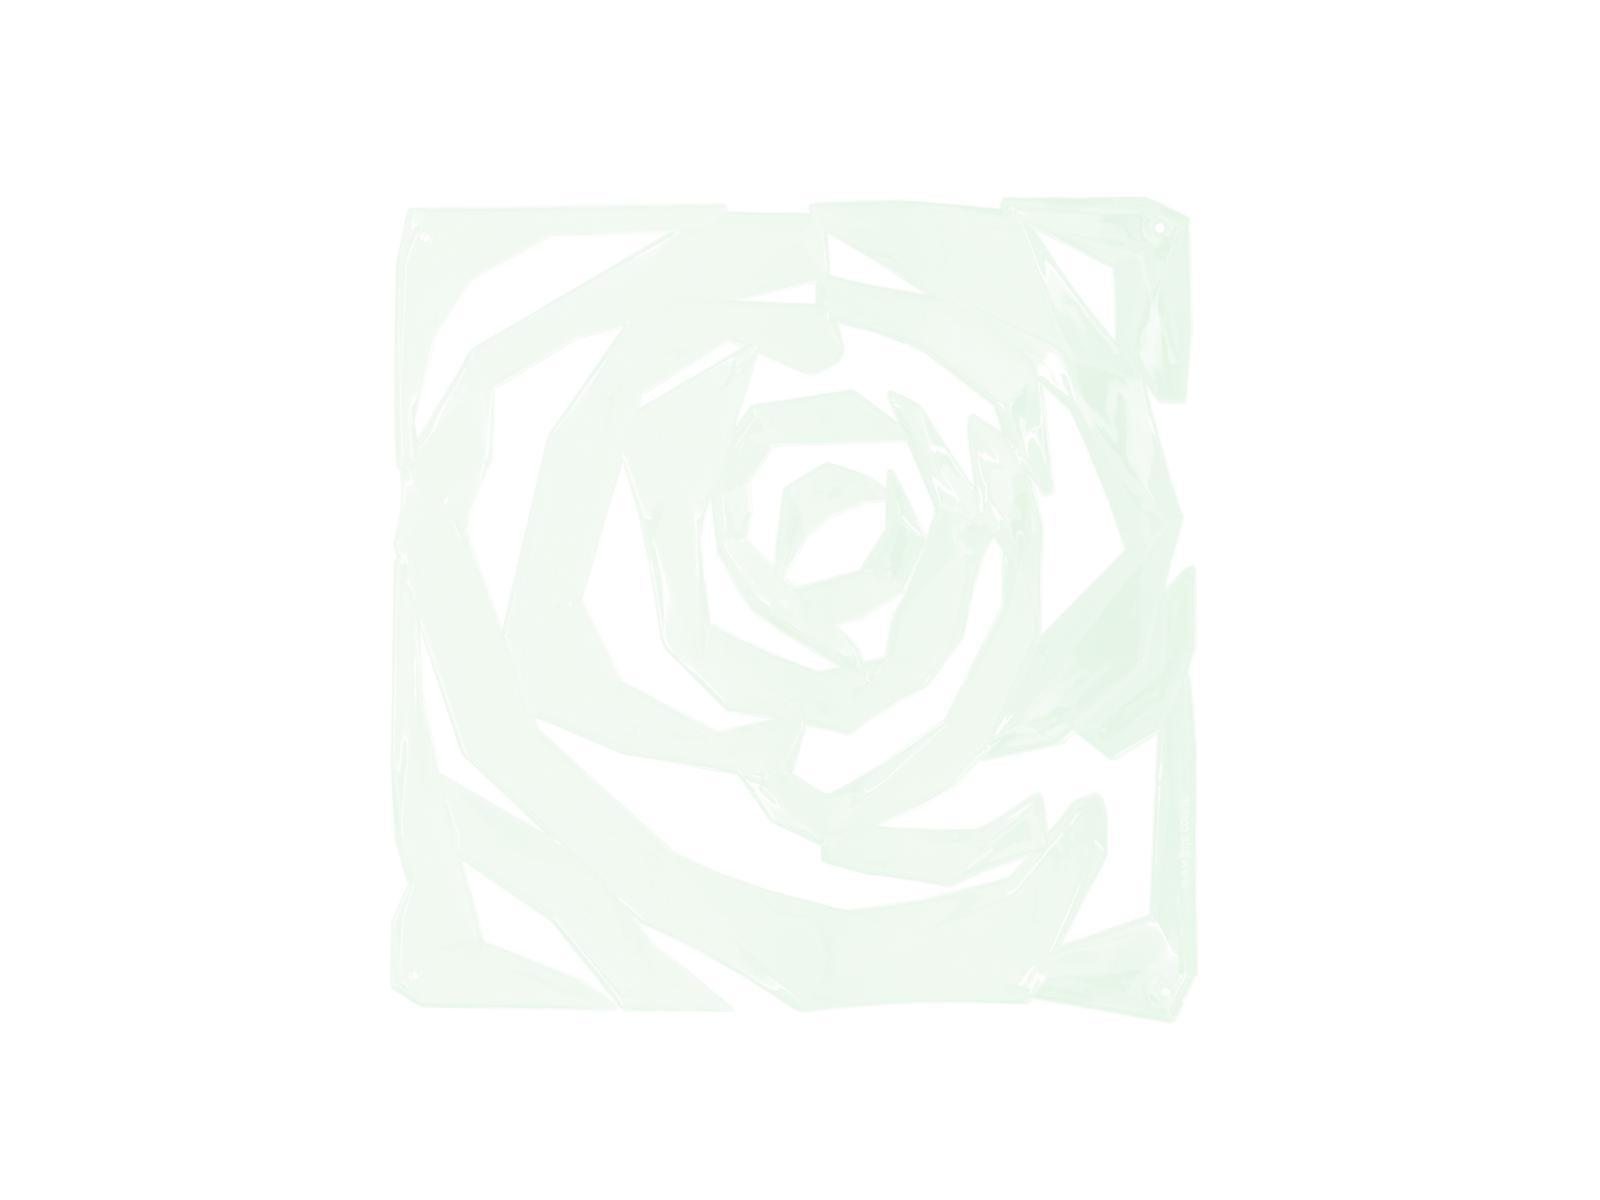 EUROPALMS Divisorio Rosa chiaro 4x